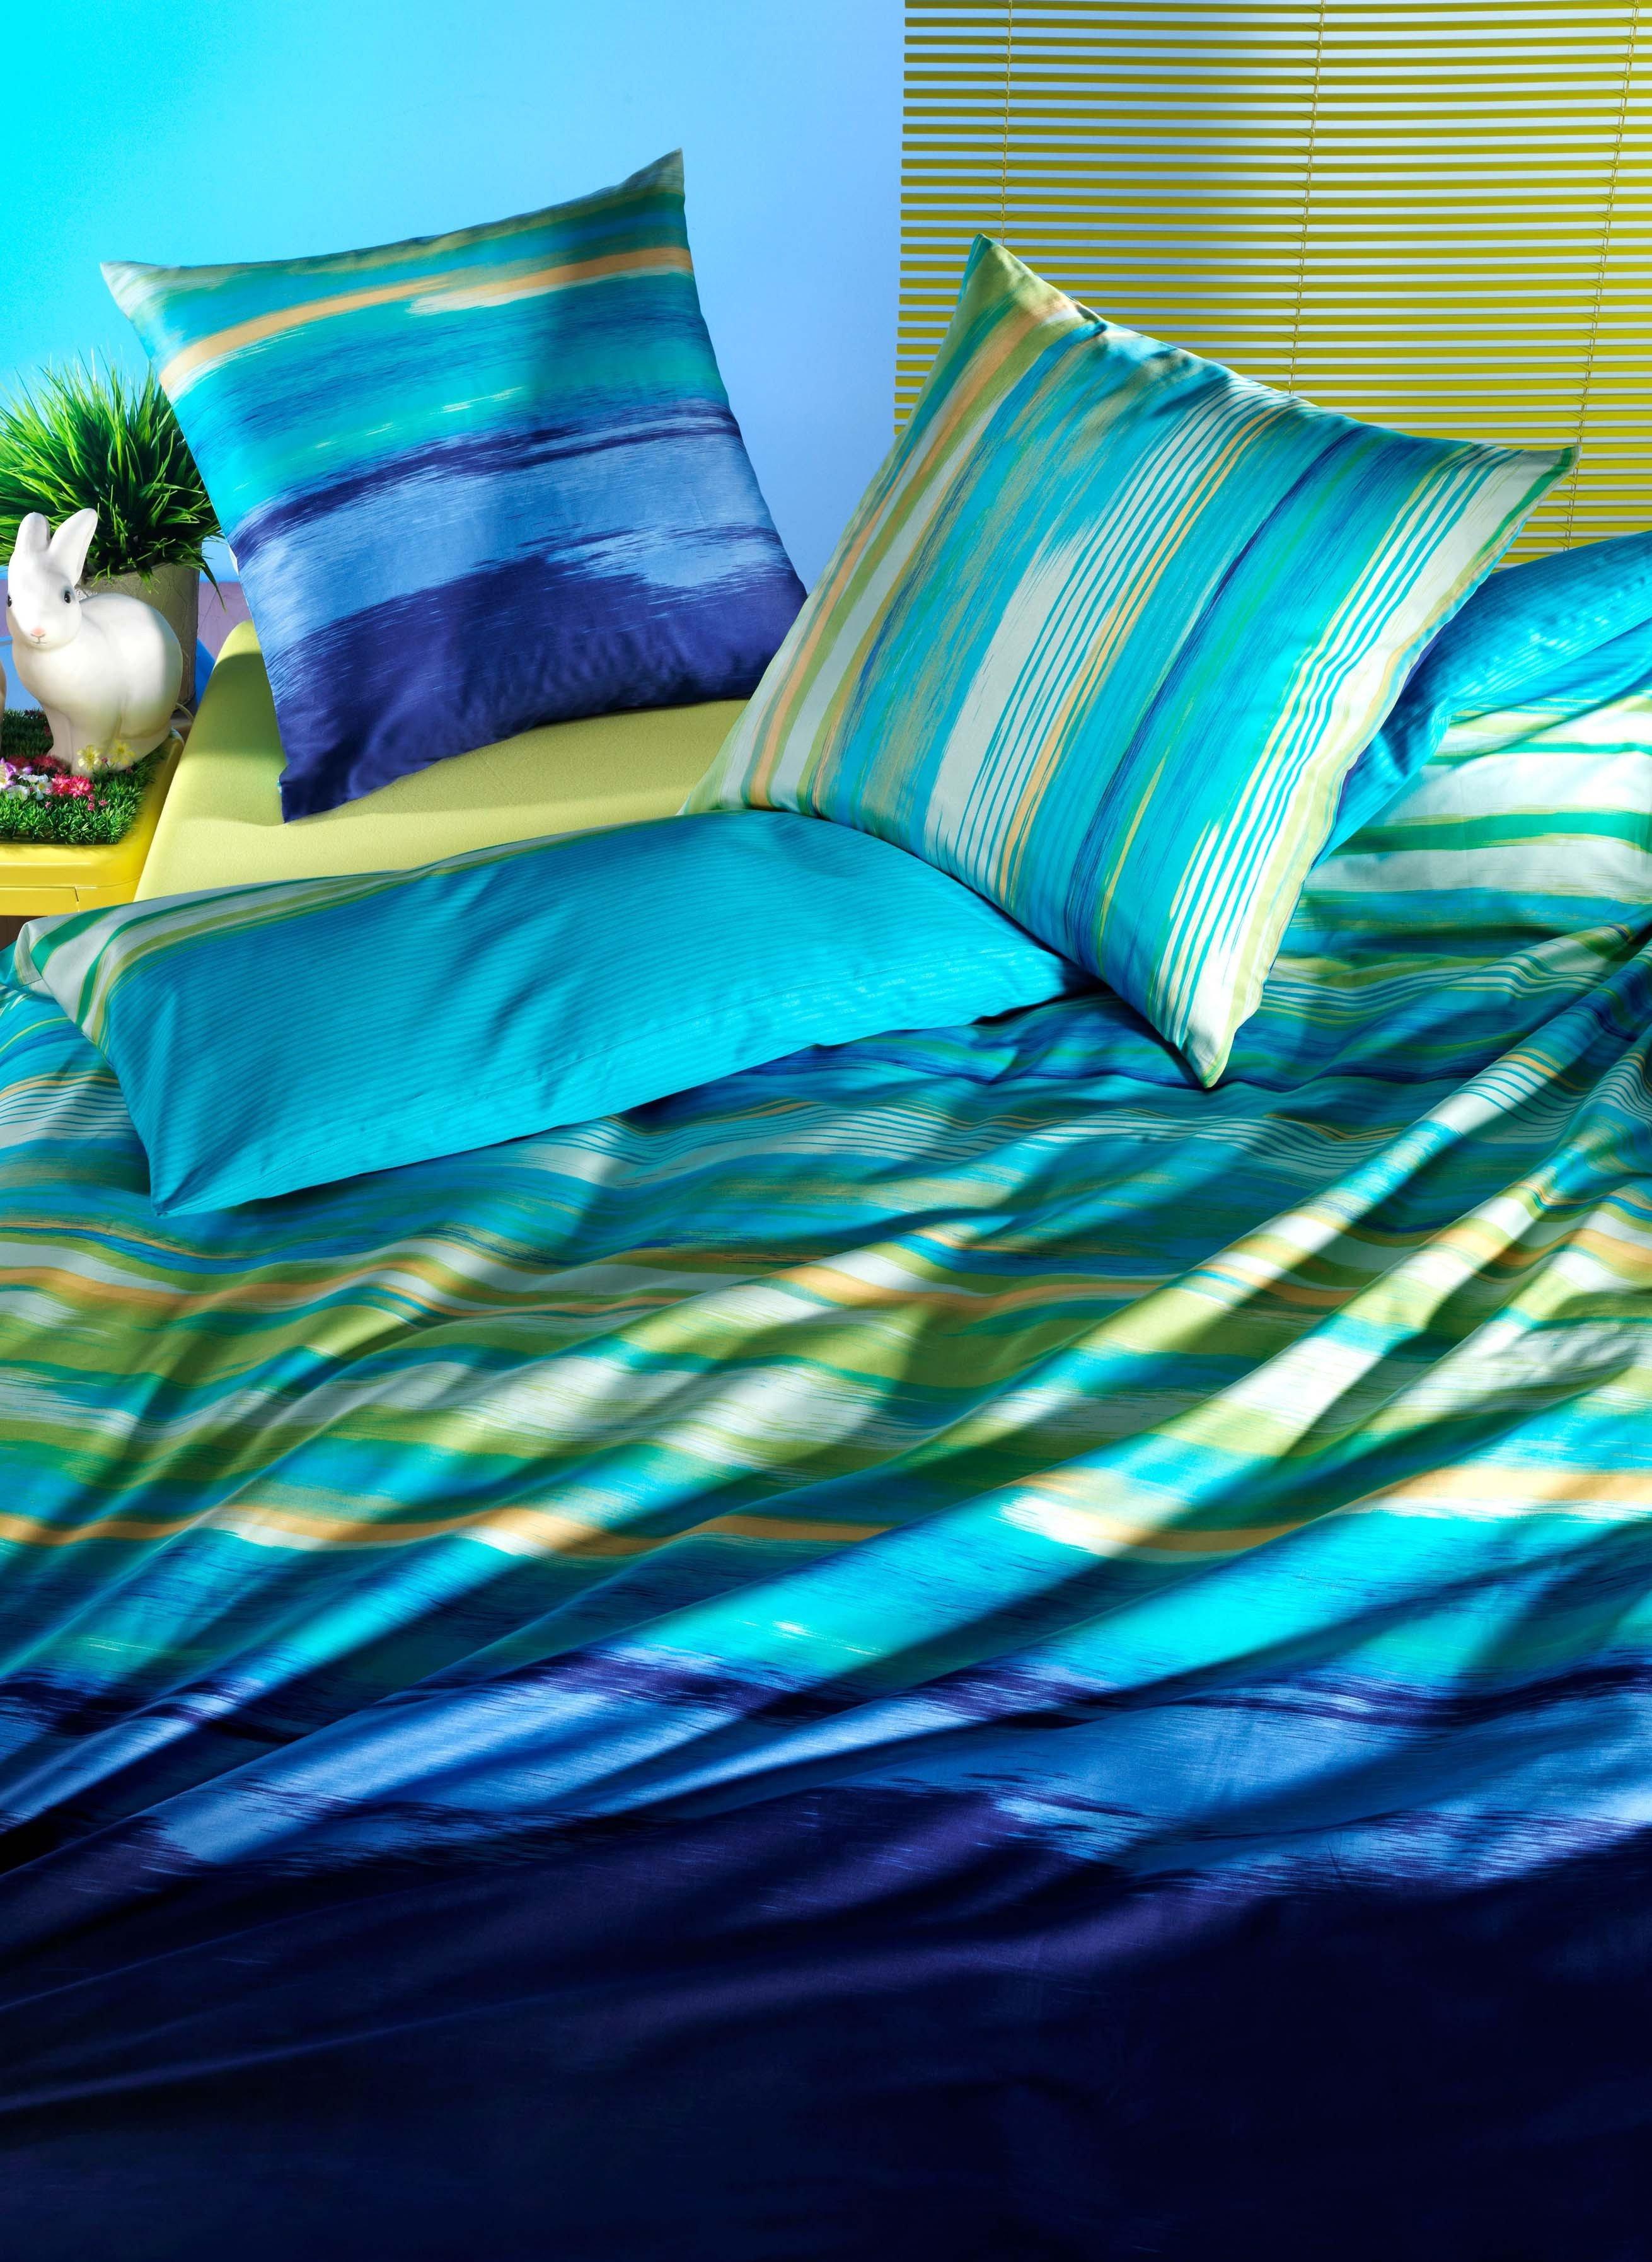 satin bettw sche niagara. Black Bedroom Furniture Sets. Home Design Ideas